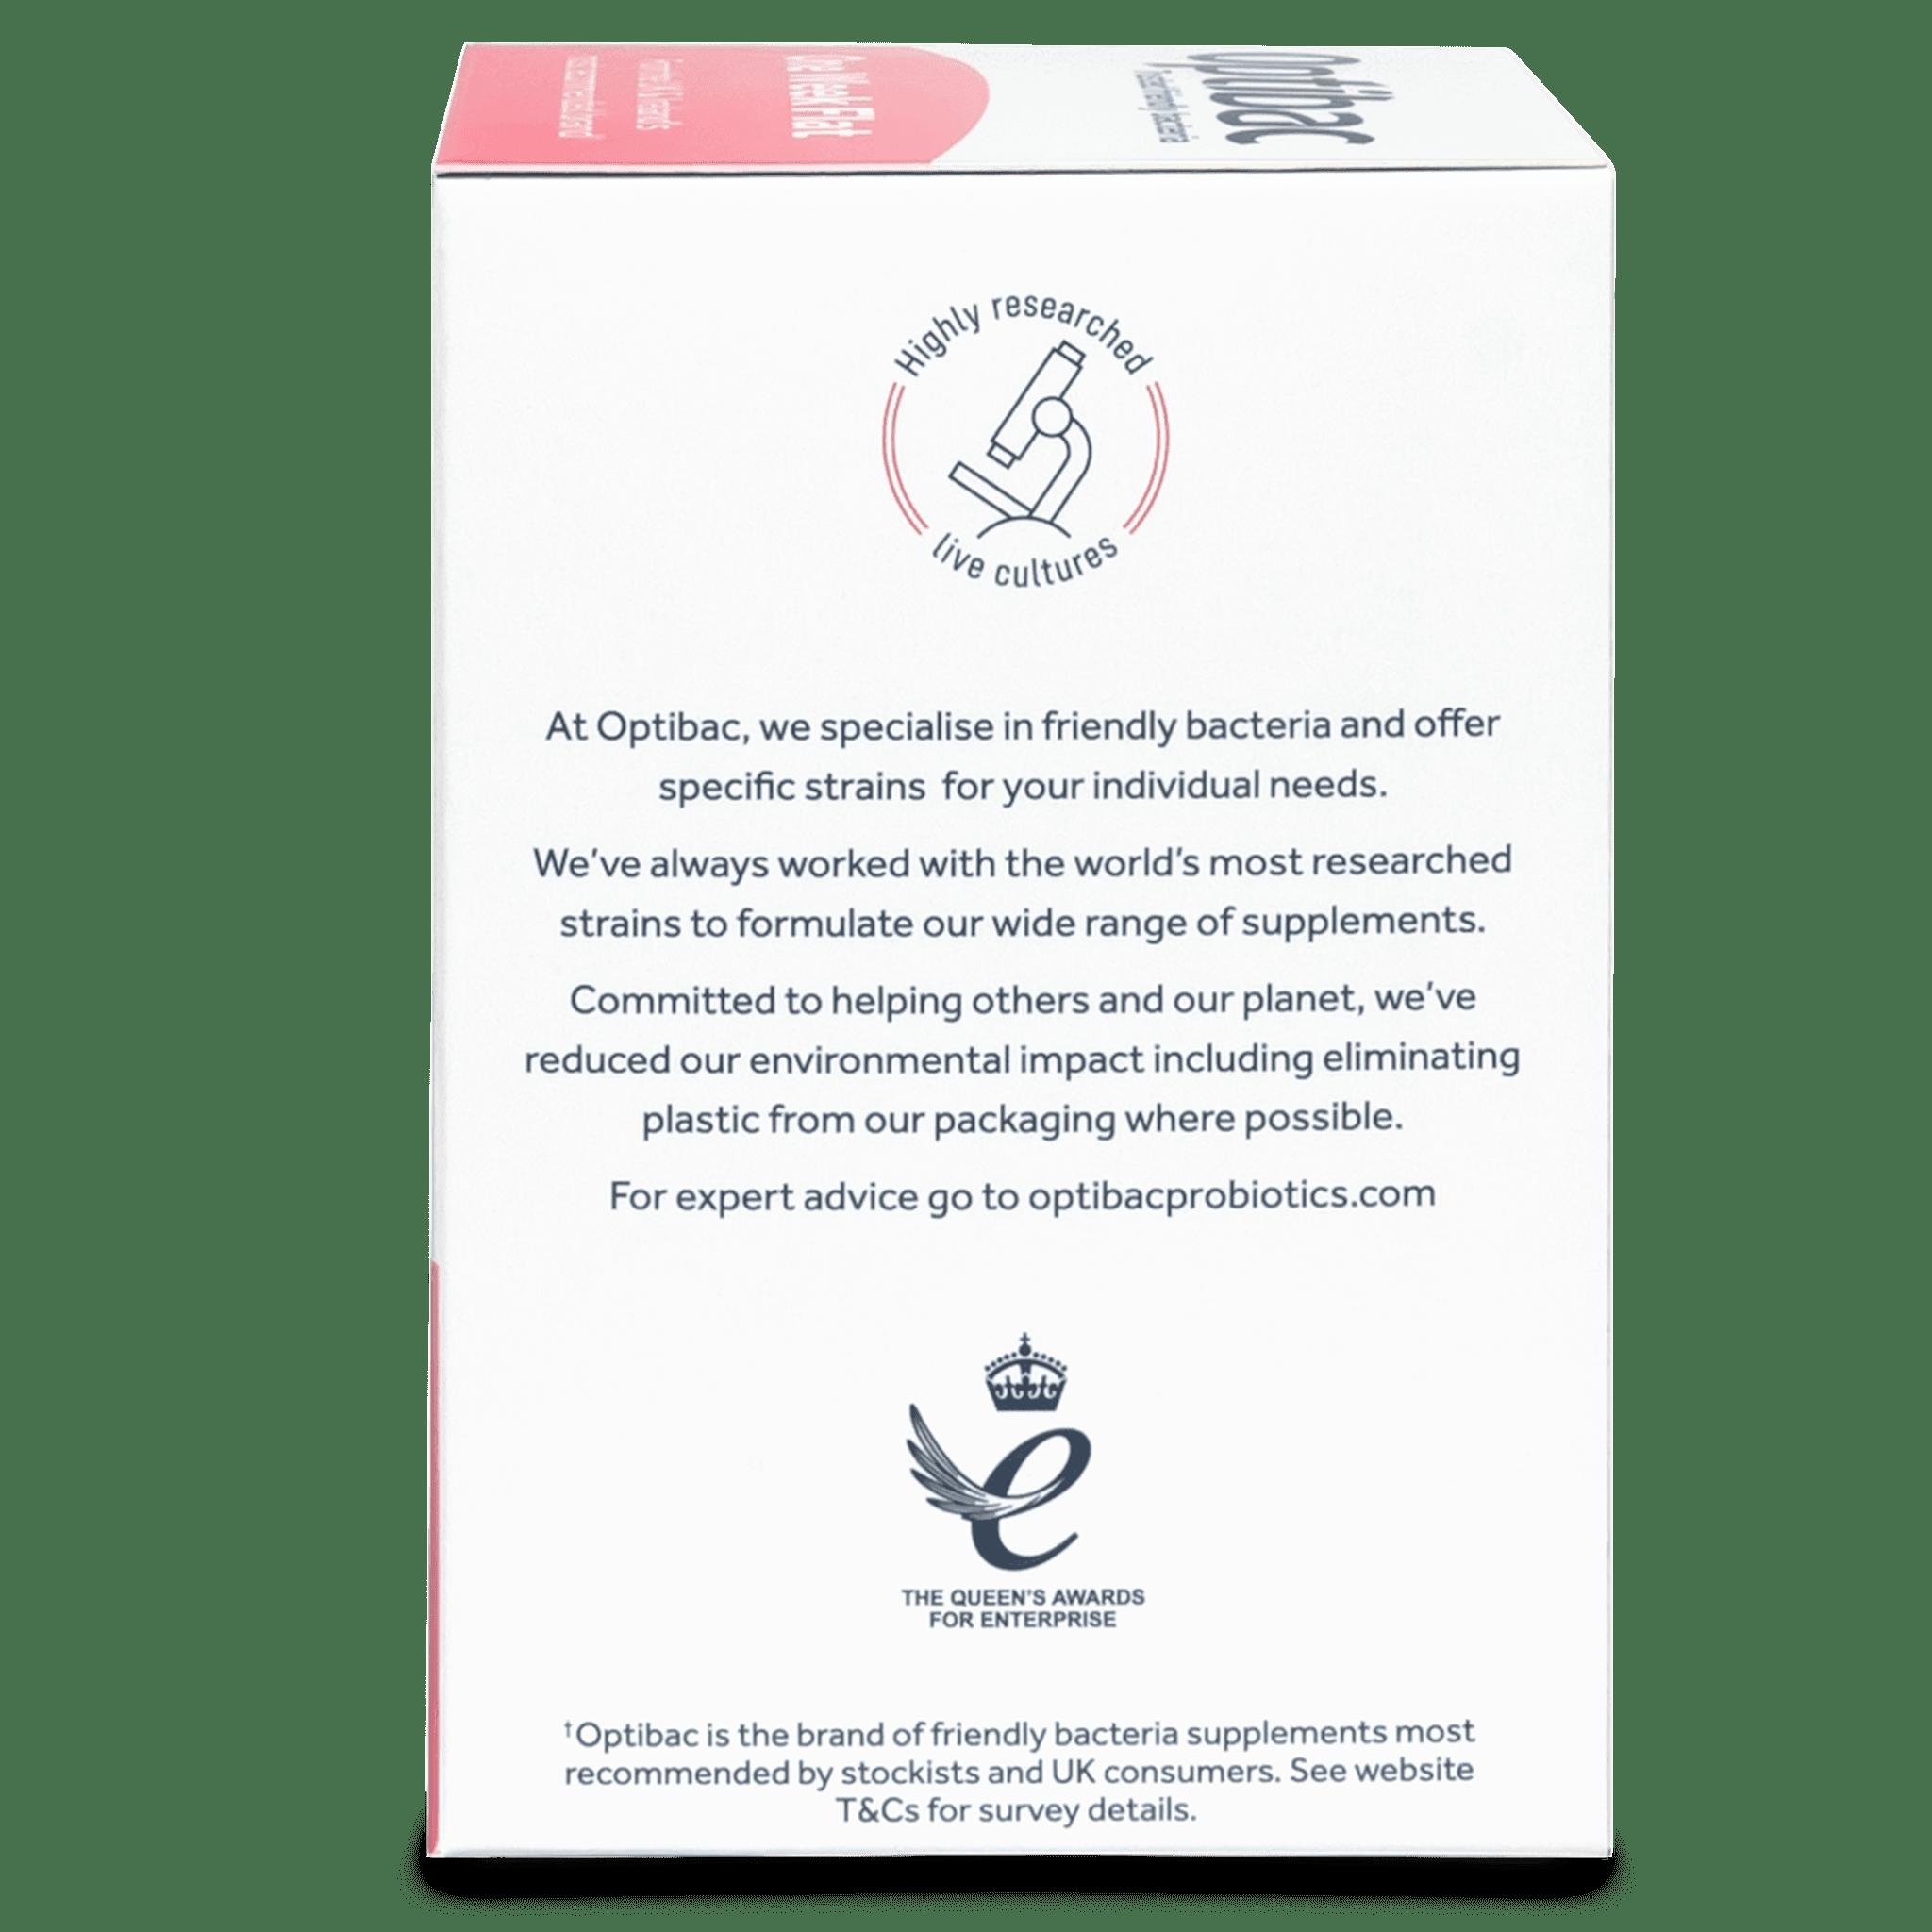 Optibac Probiotics One Week Flat (28 sachets) pack side shot